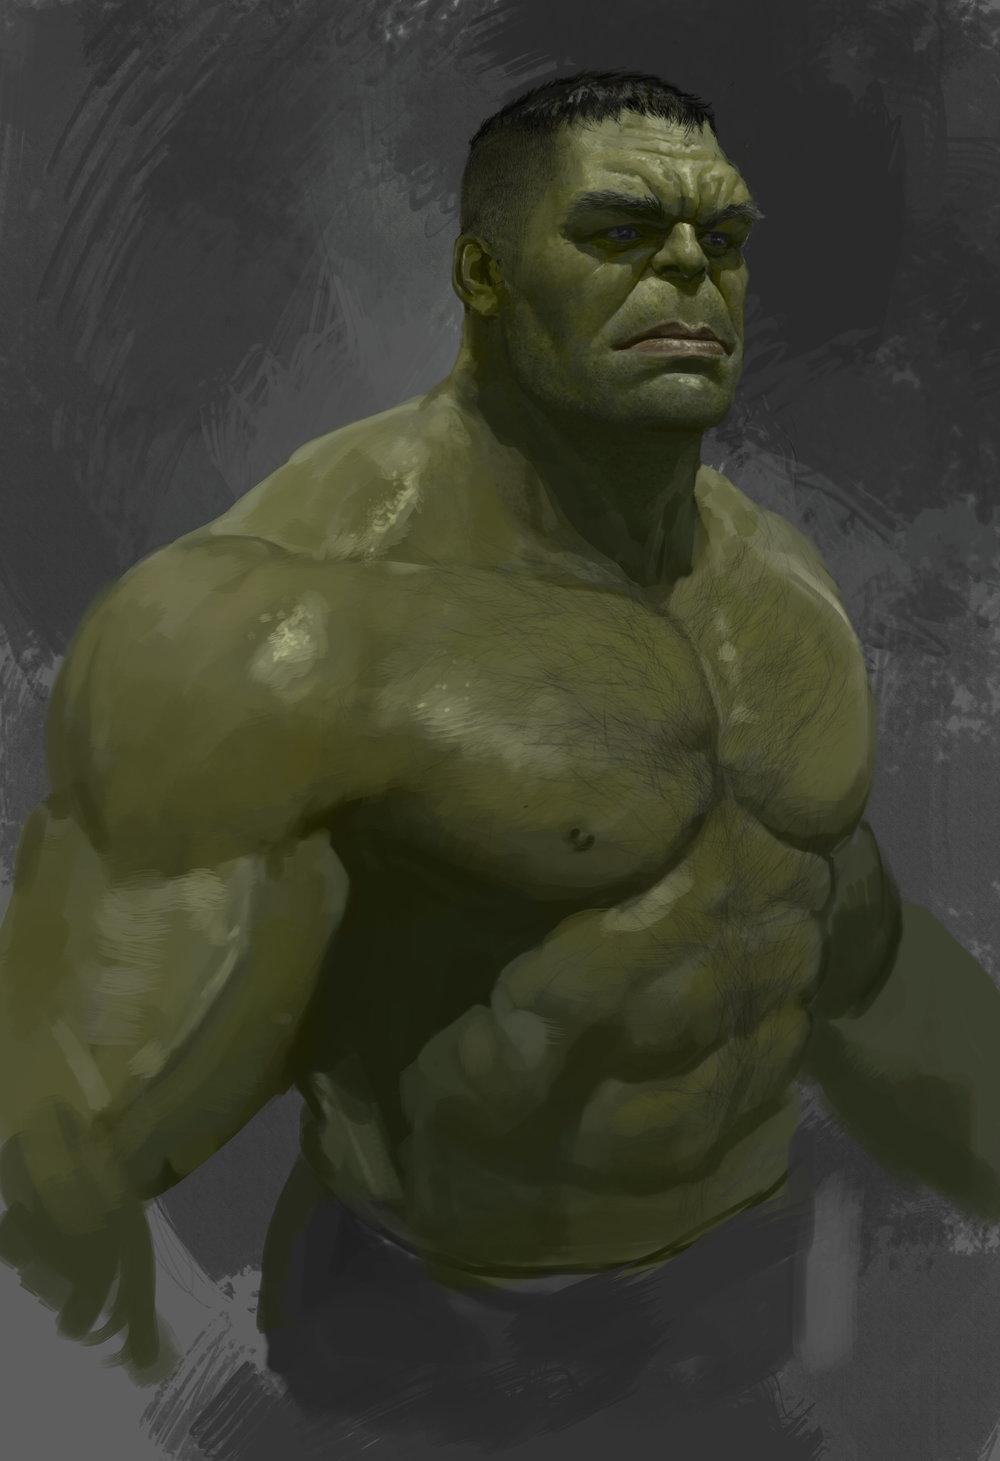 ryan-meinerding-hulk-hex-5.jpg